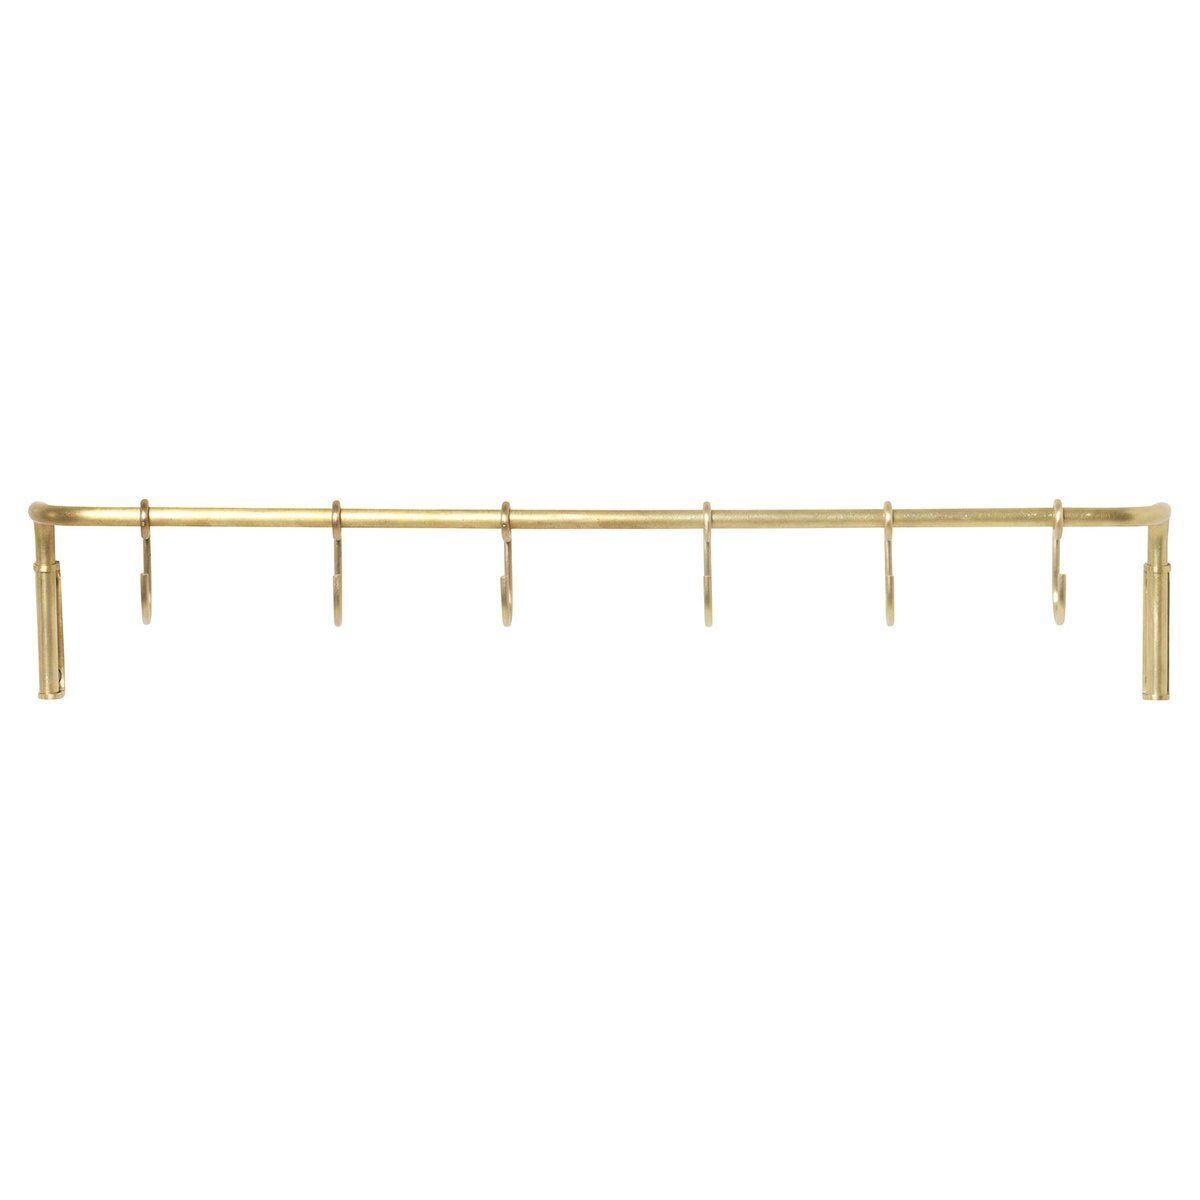 Ferm Living Kitchen rod with 6 hooks, brass